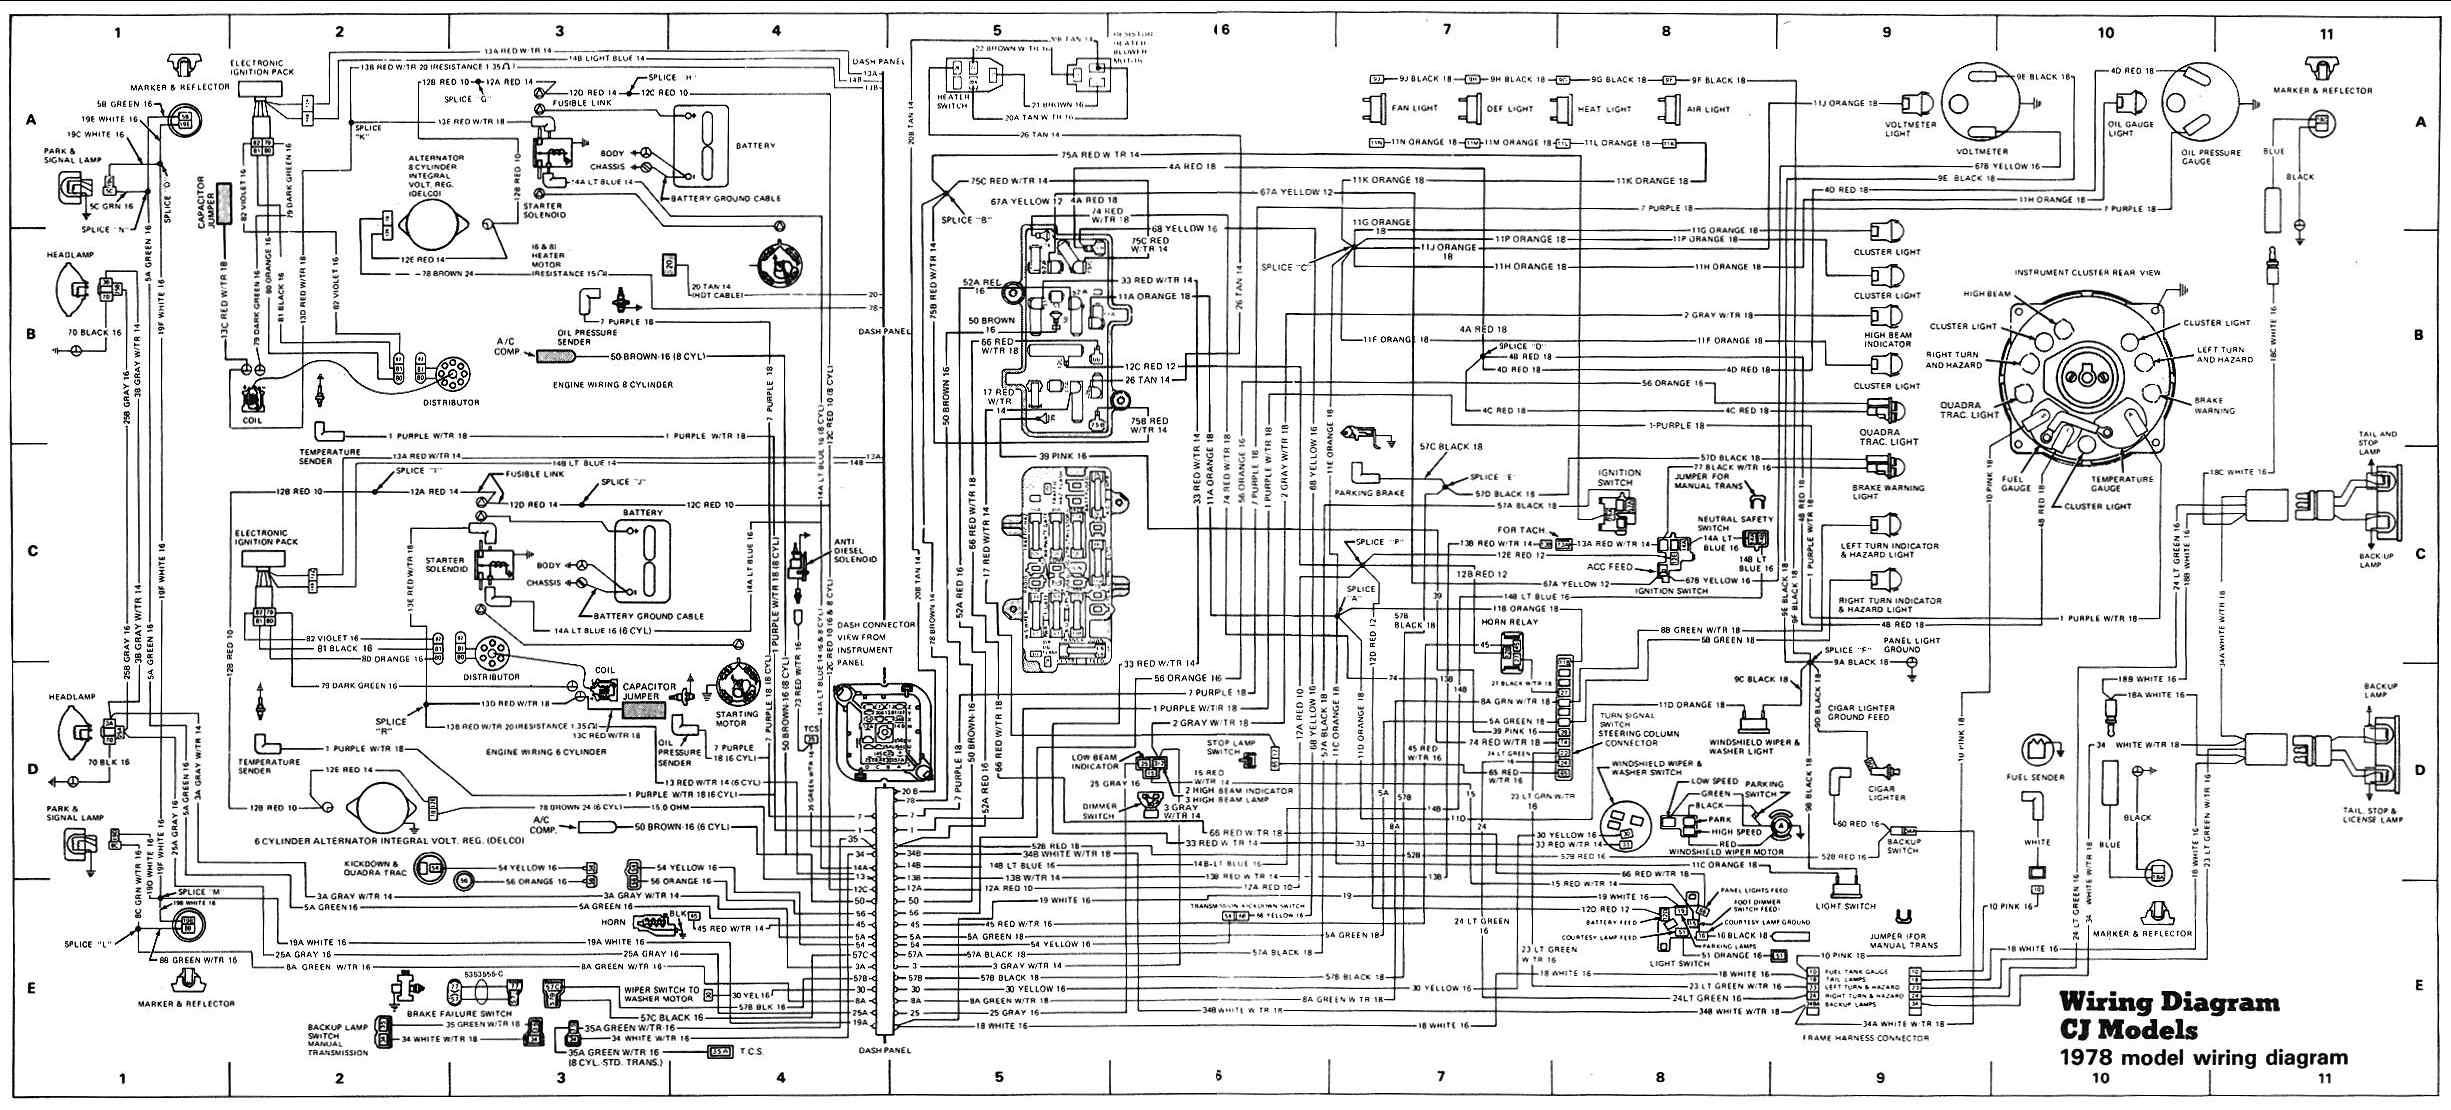 small resolution of cj8 wiring harness diagram simple wiring post fuse box diagram fuse panel diagram cj8